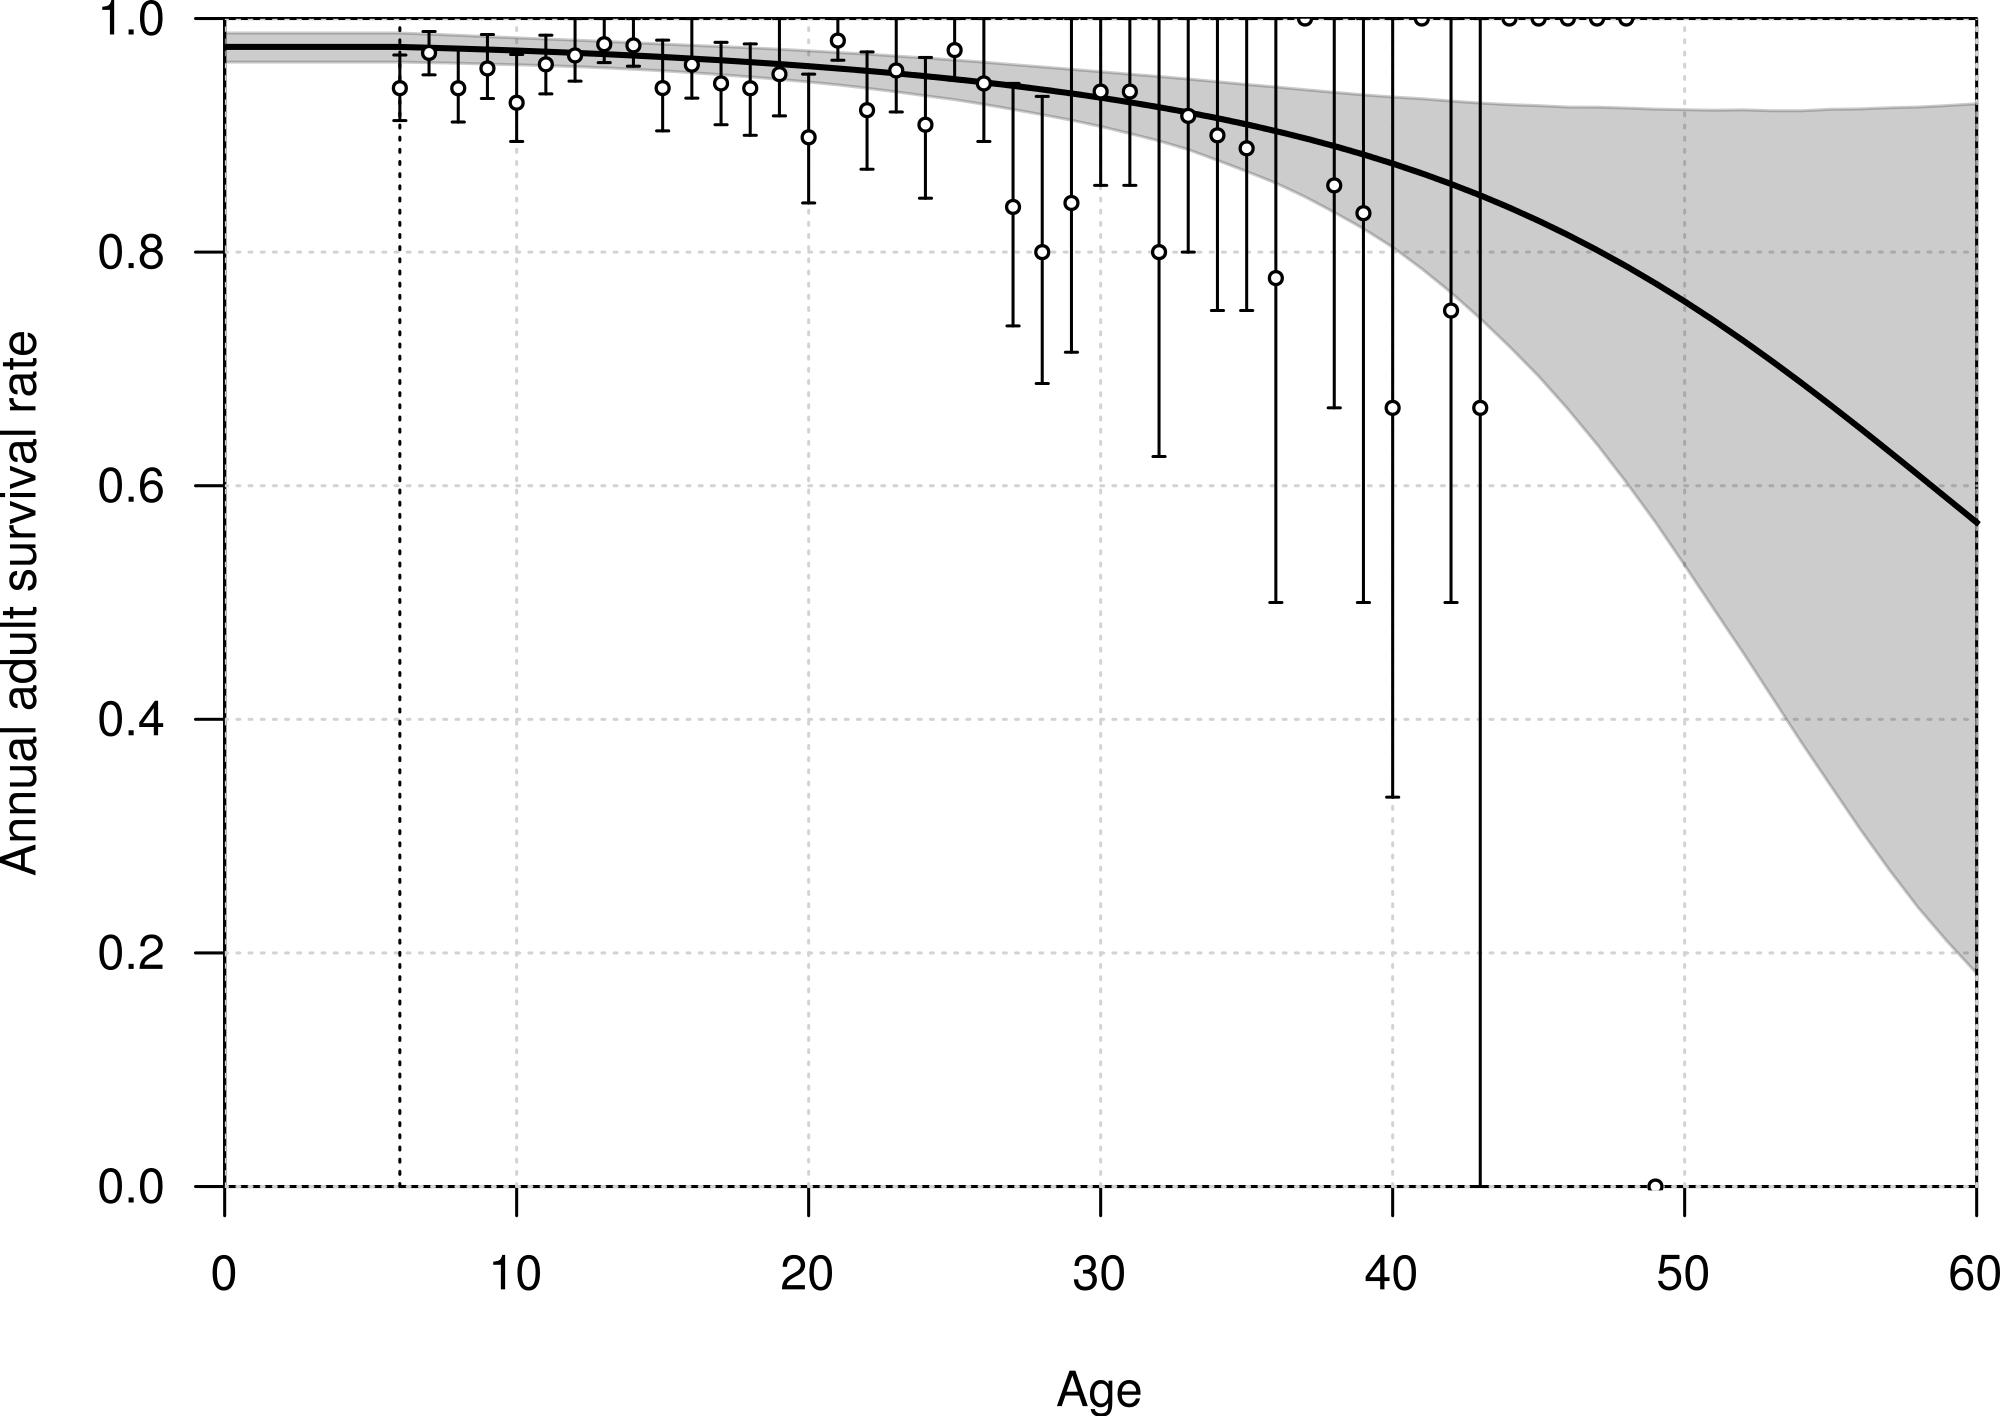 Demographic rates of northern royal albatross at Taiaroa